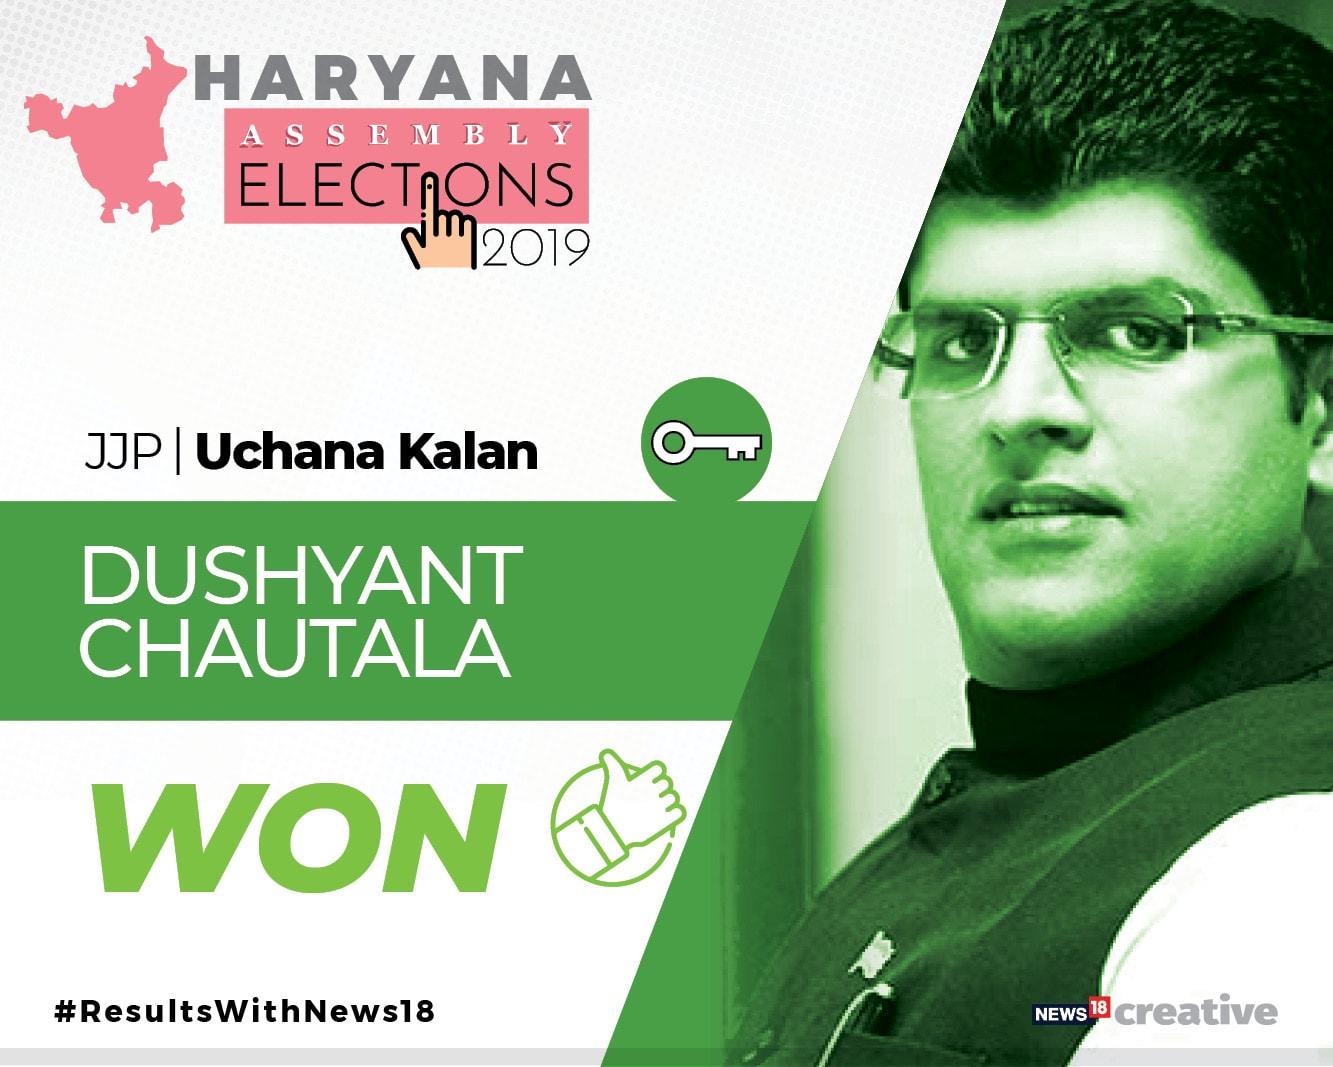 JJP's Dushyant Chautala wins Uchana Kalan seat. Haryana Assembly elections 2019